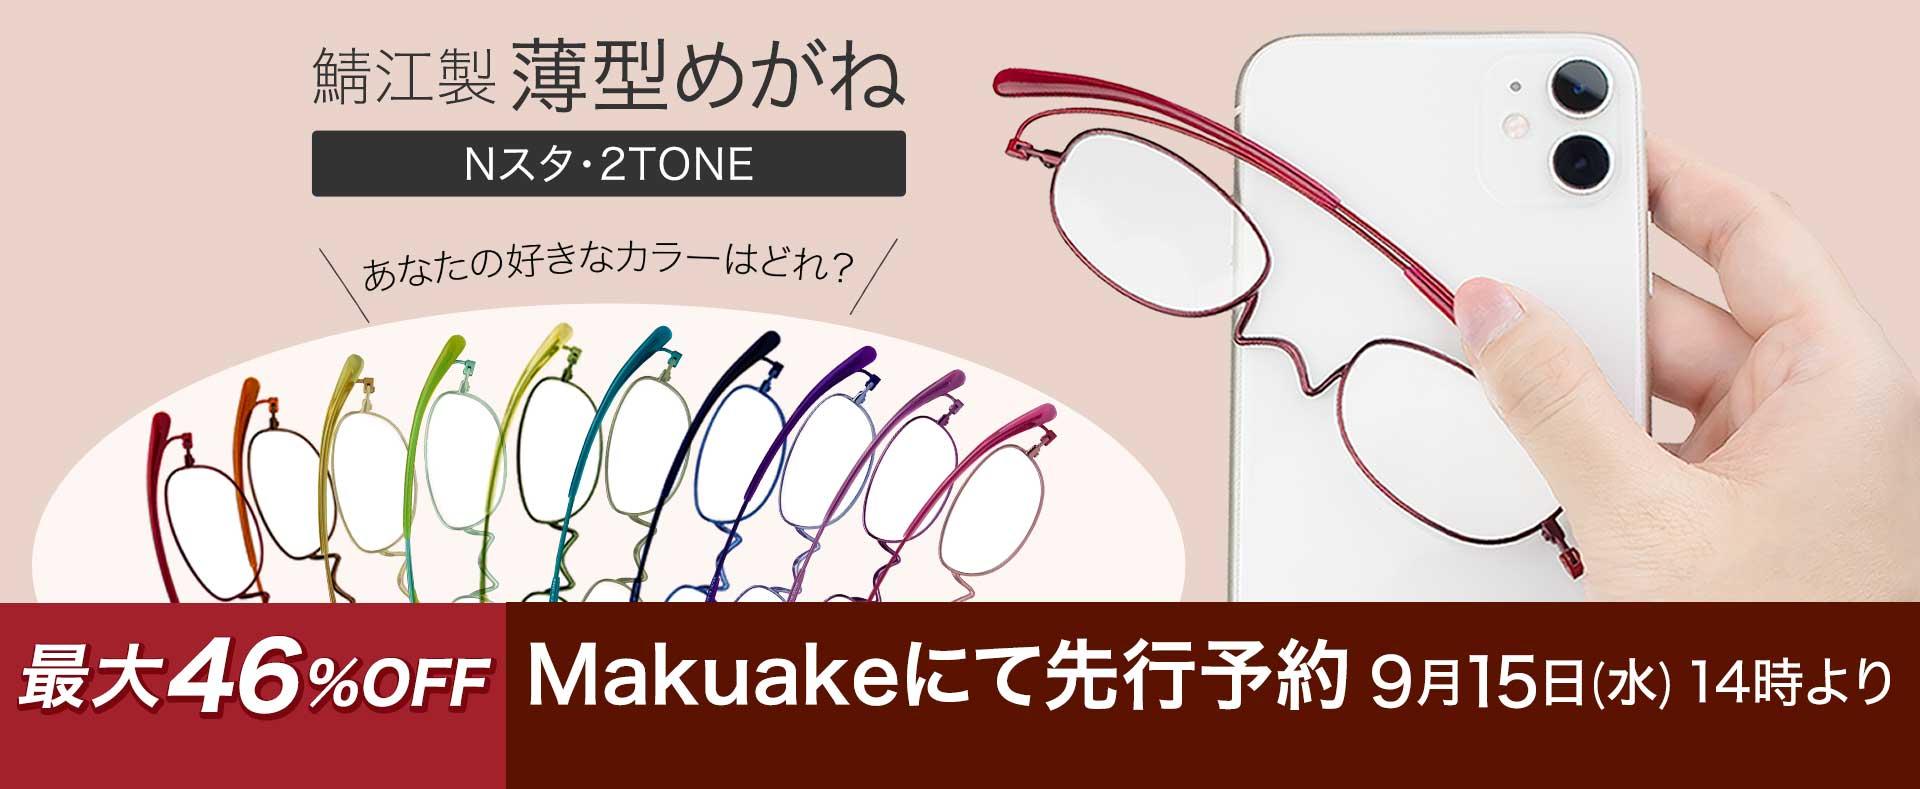 MakuakeNスタ2TONE先行予約